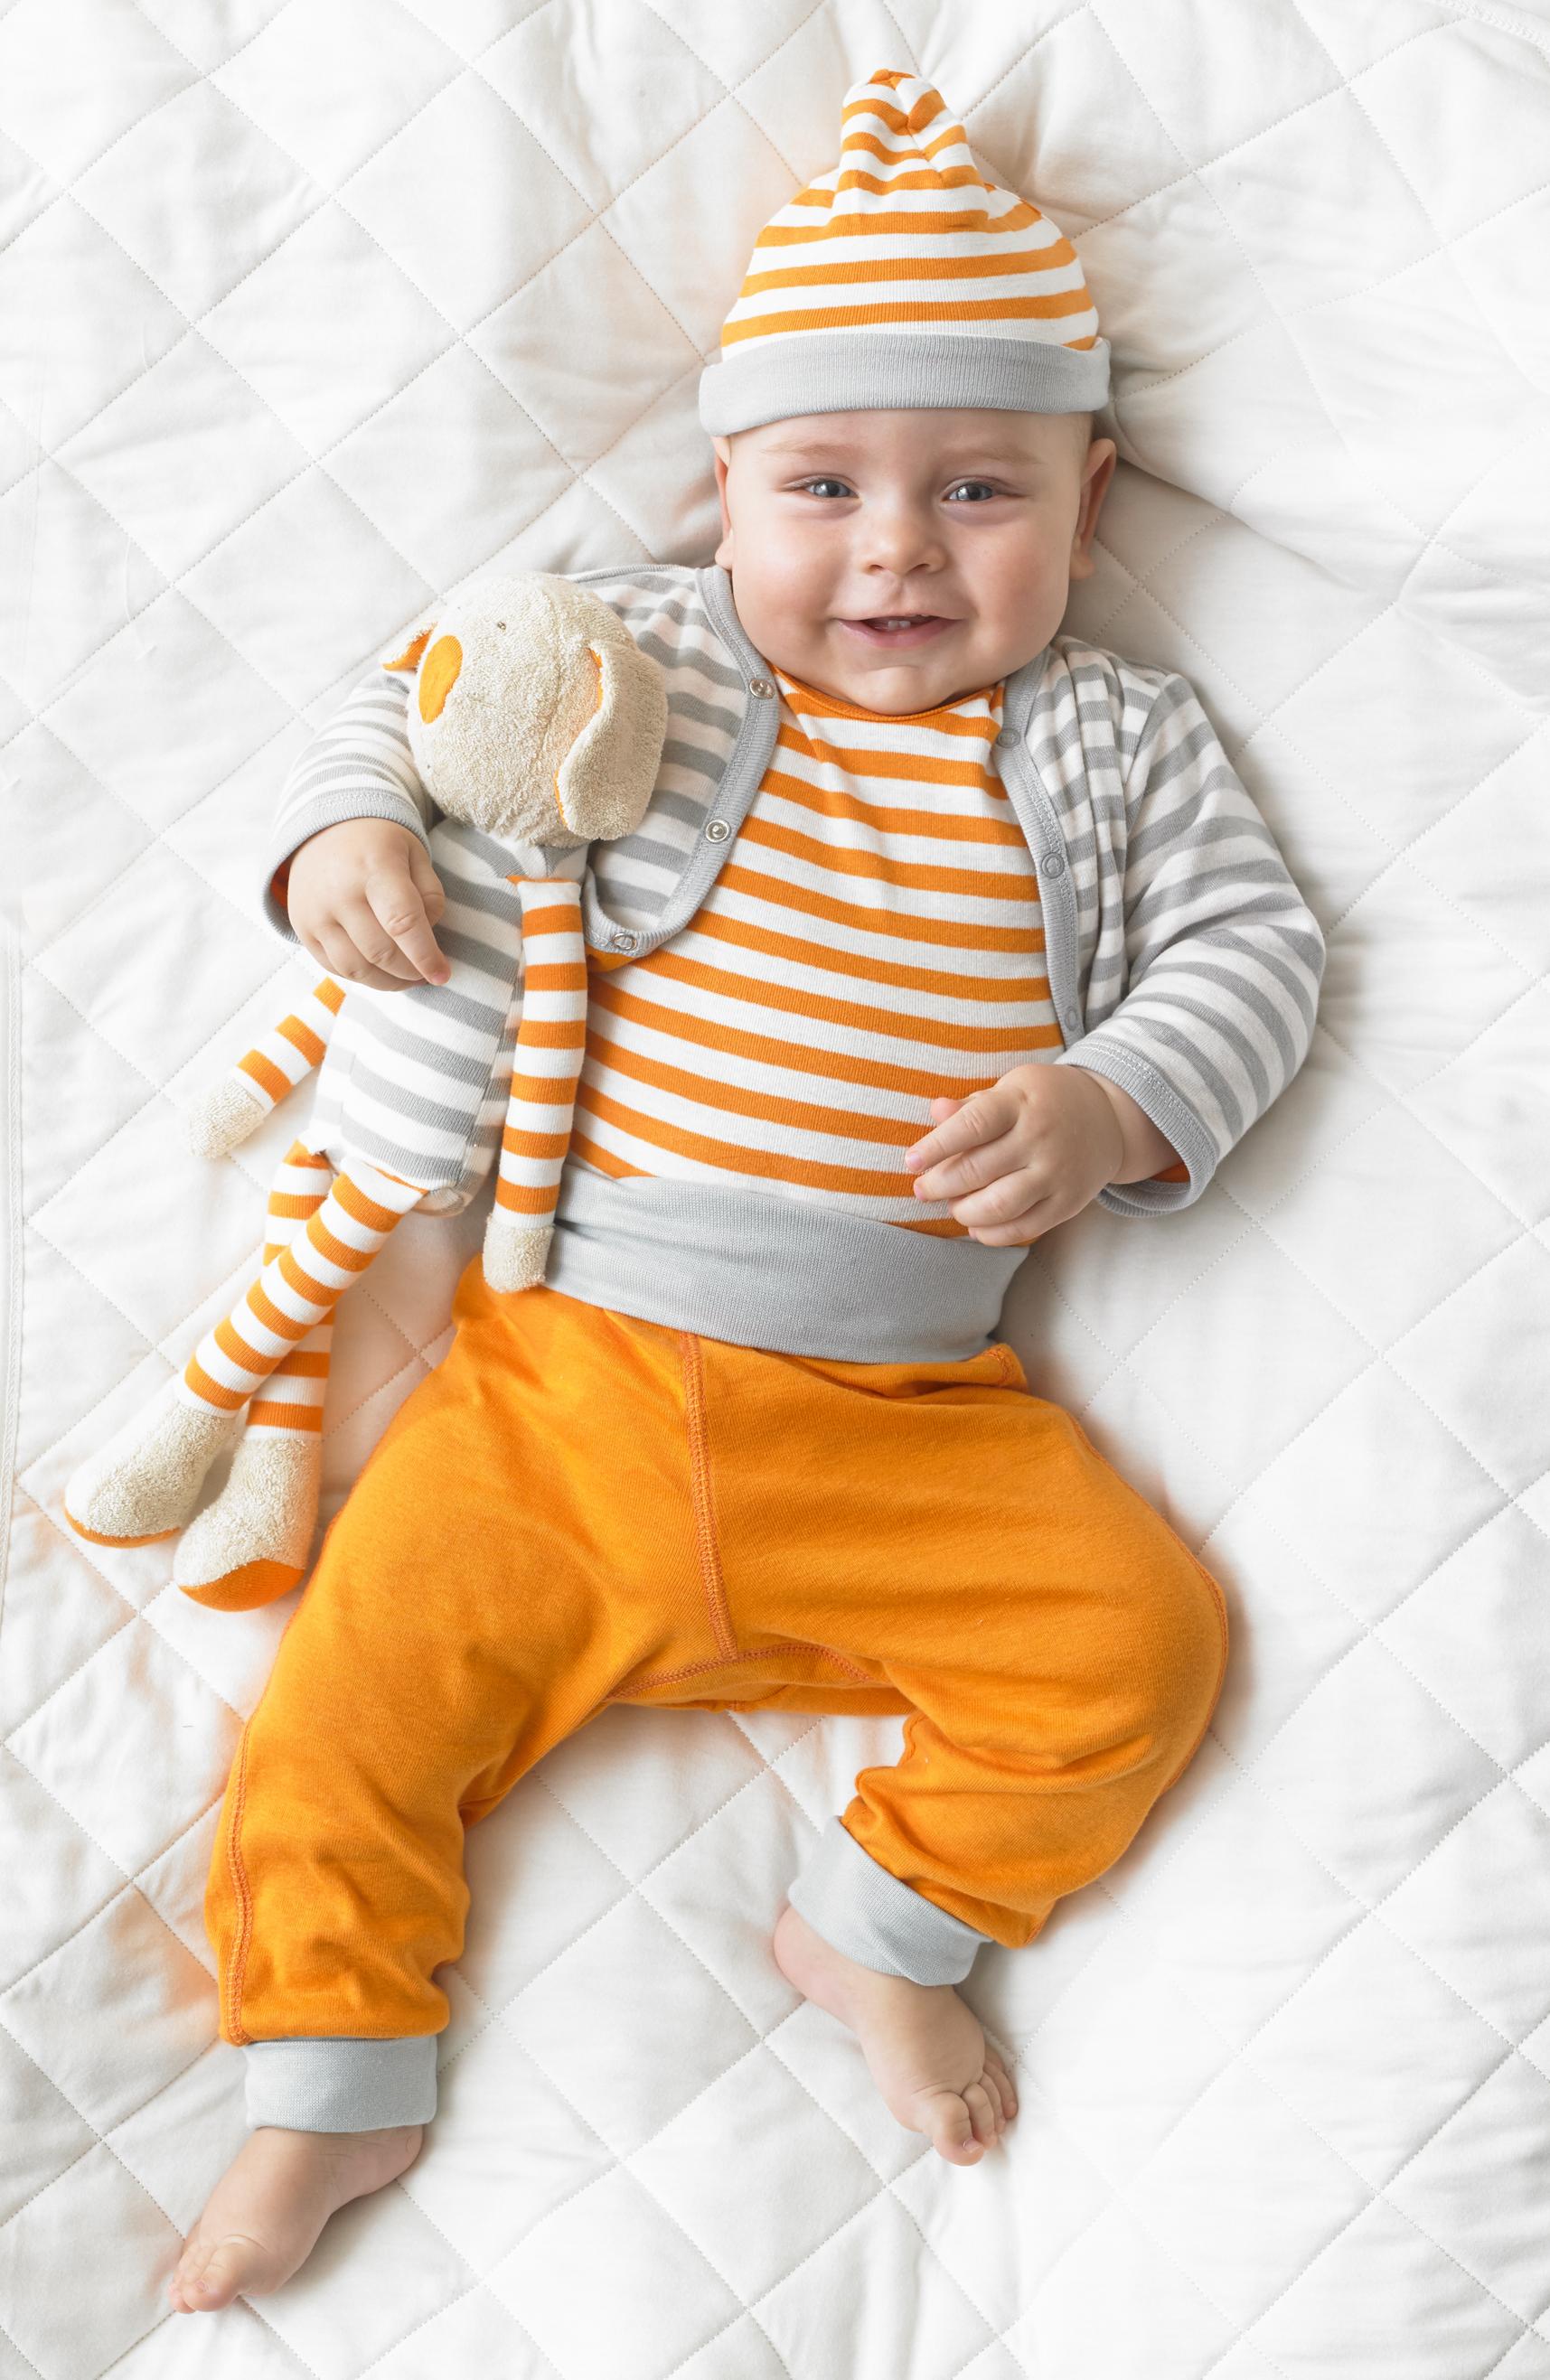 GBB Shot With Baby_V8ap.jpg